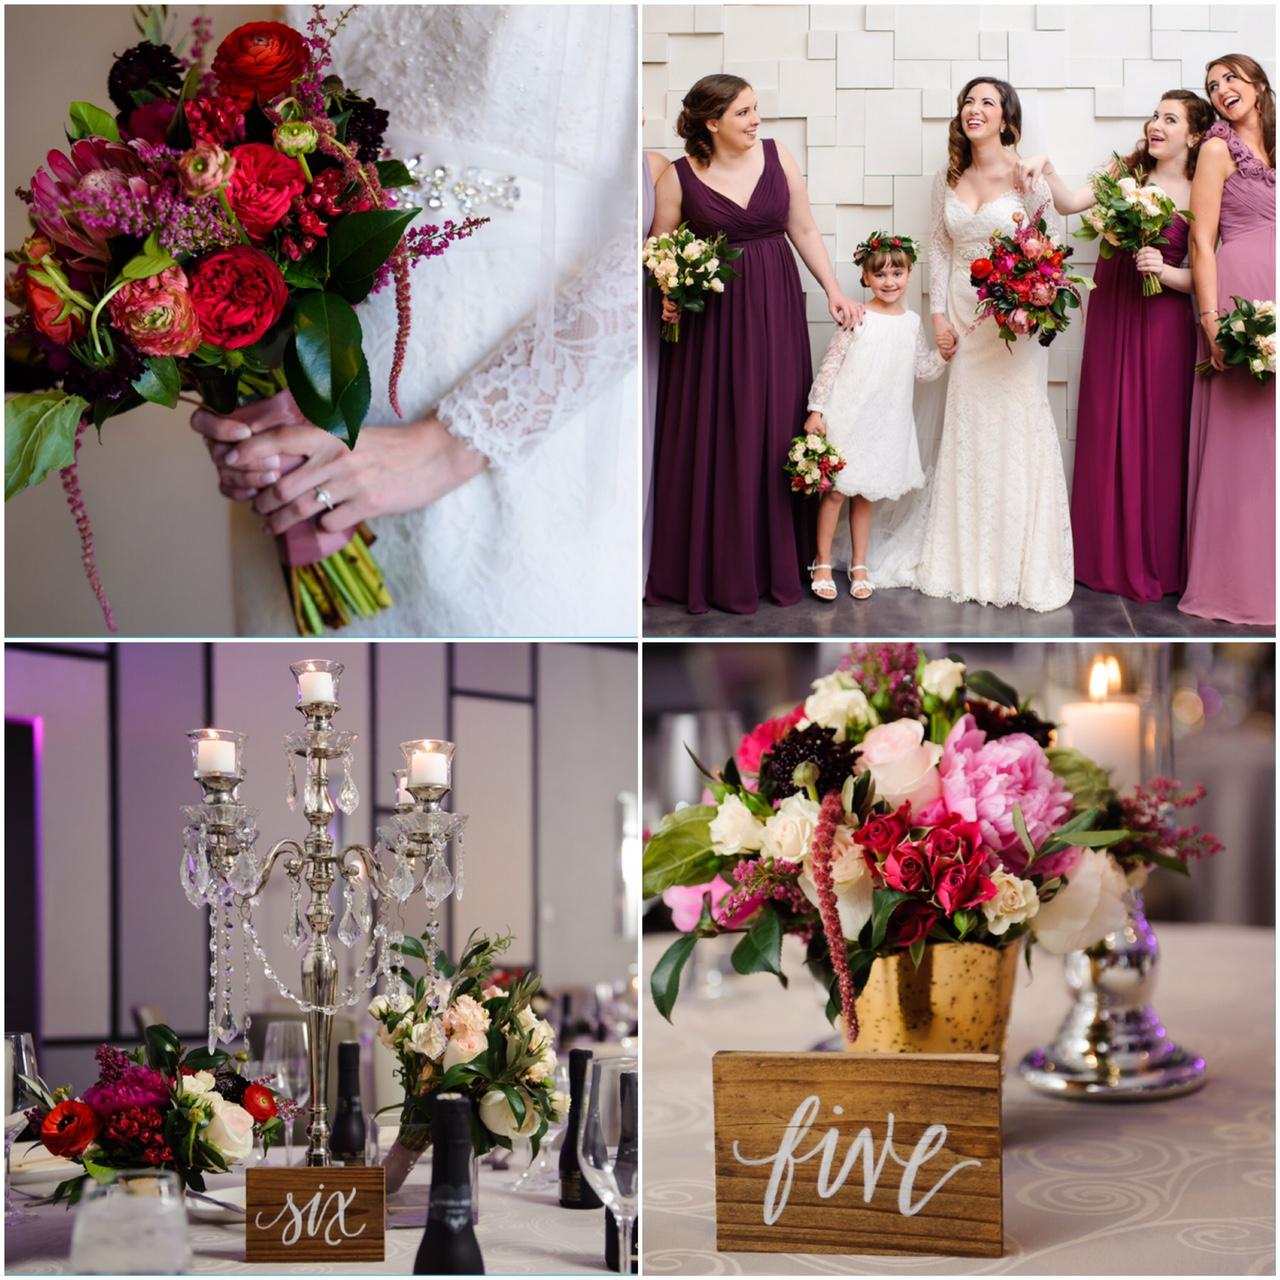 Rustic & Bohemian wedding ideas